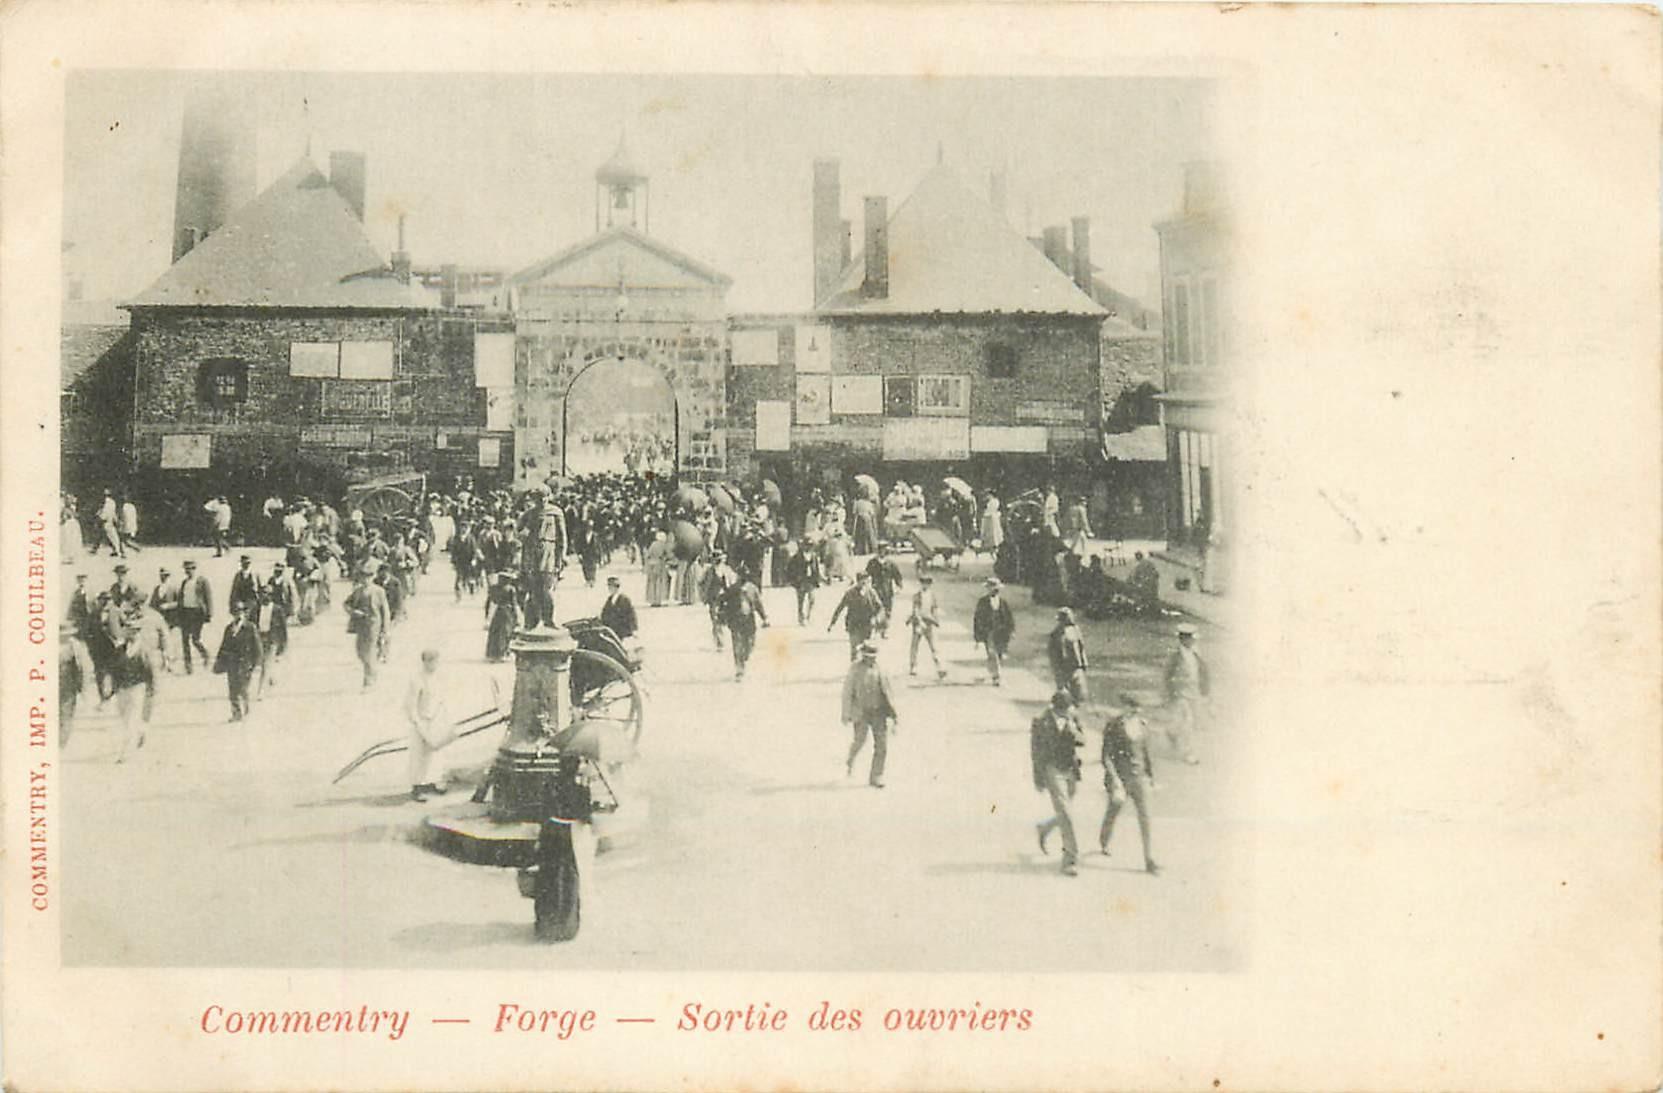 03 COMMENTRY. 2 Cpa Forge et Sortie des Ouvriers 1902